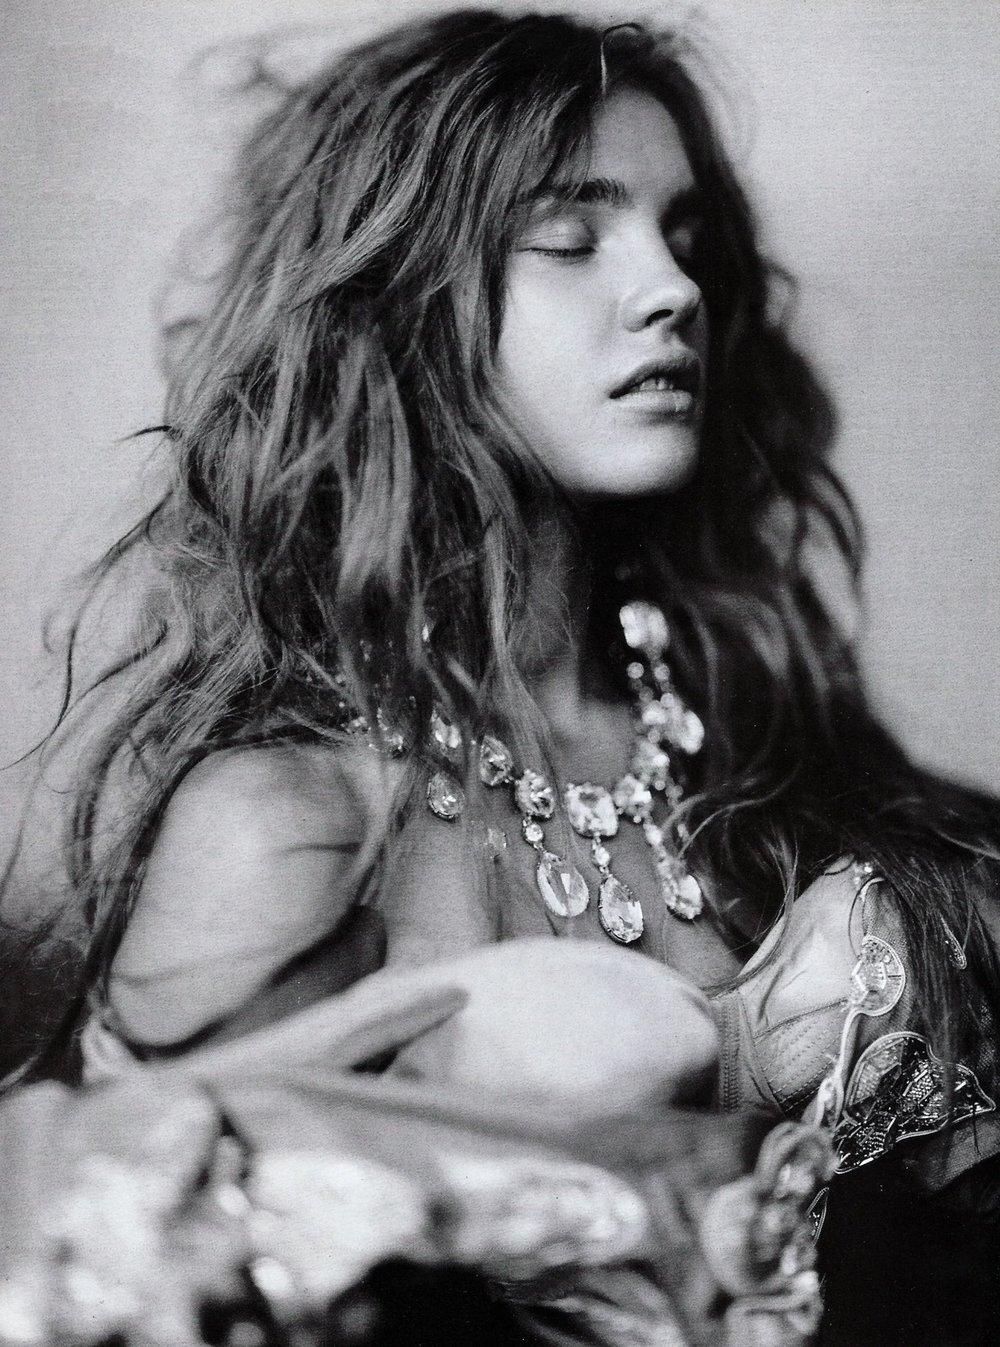 Natalia Vodianova by Paolo Roversi for Vogue Italia, September 2004